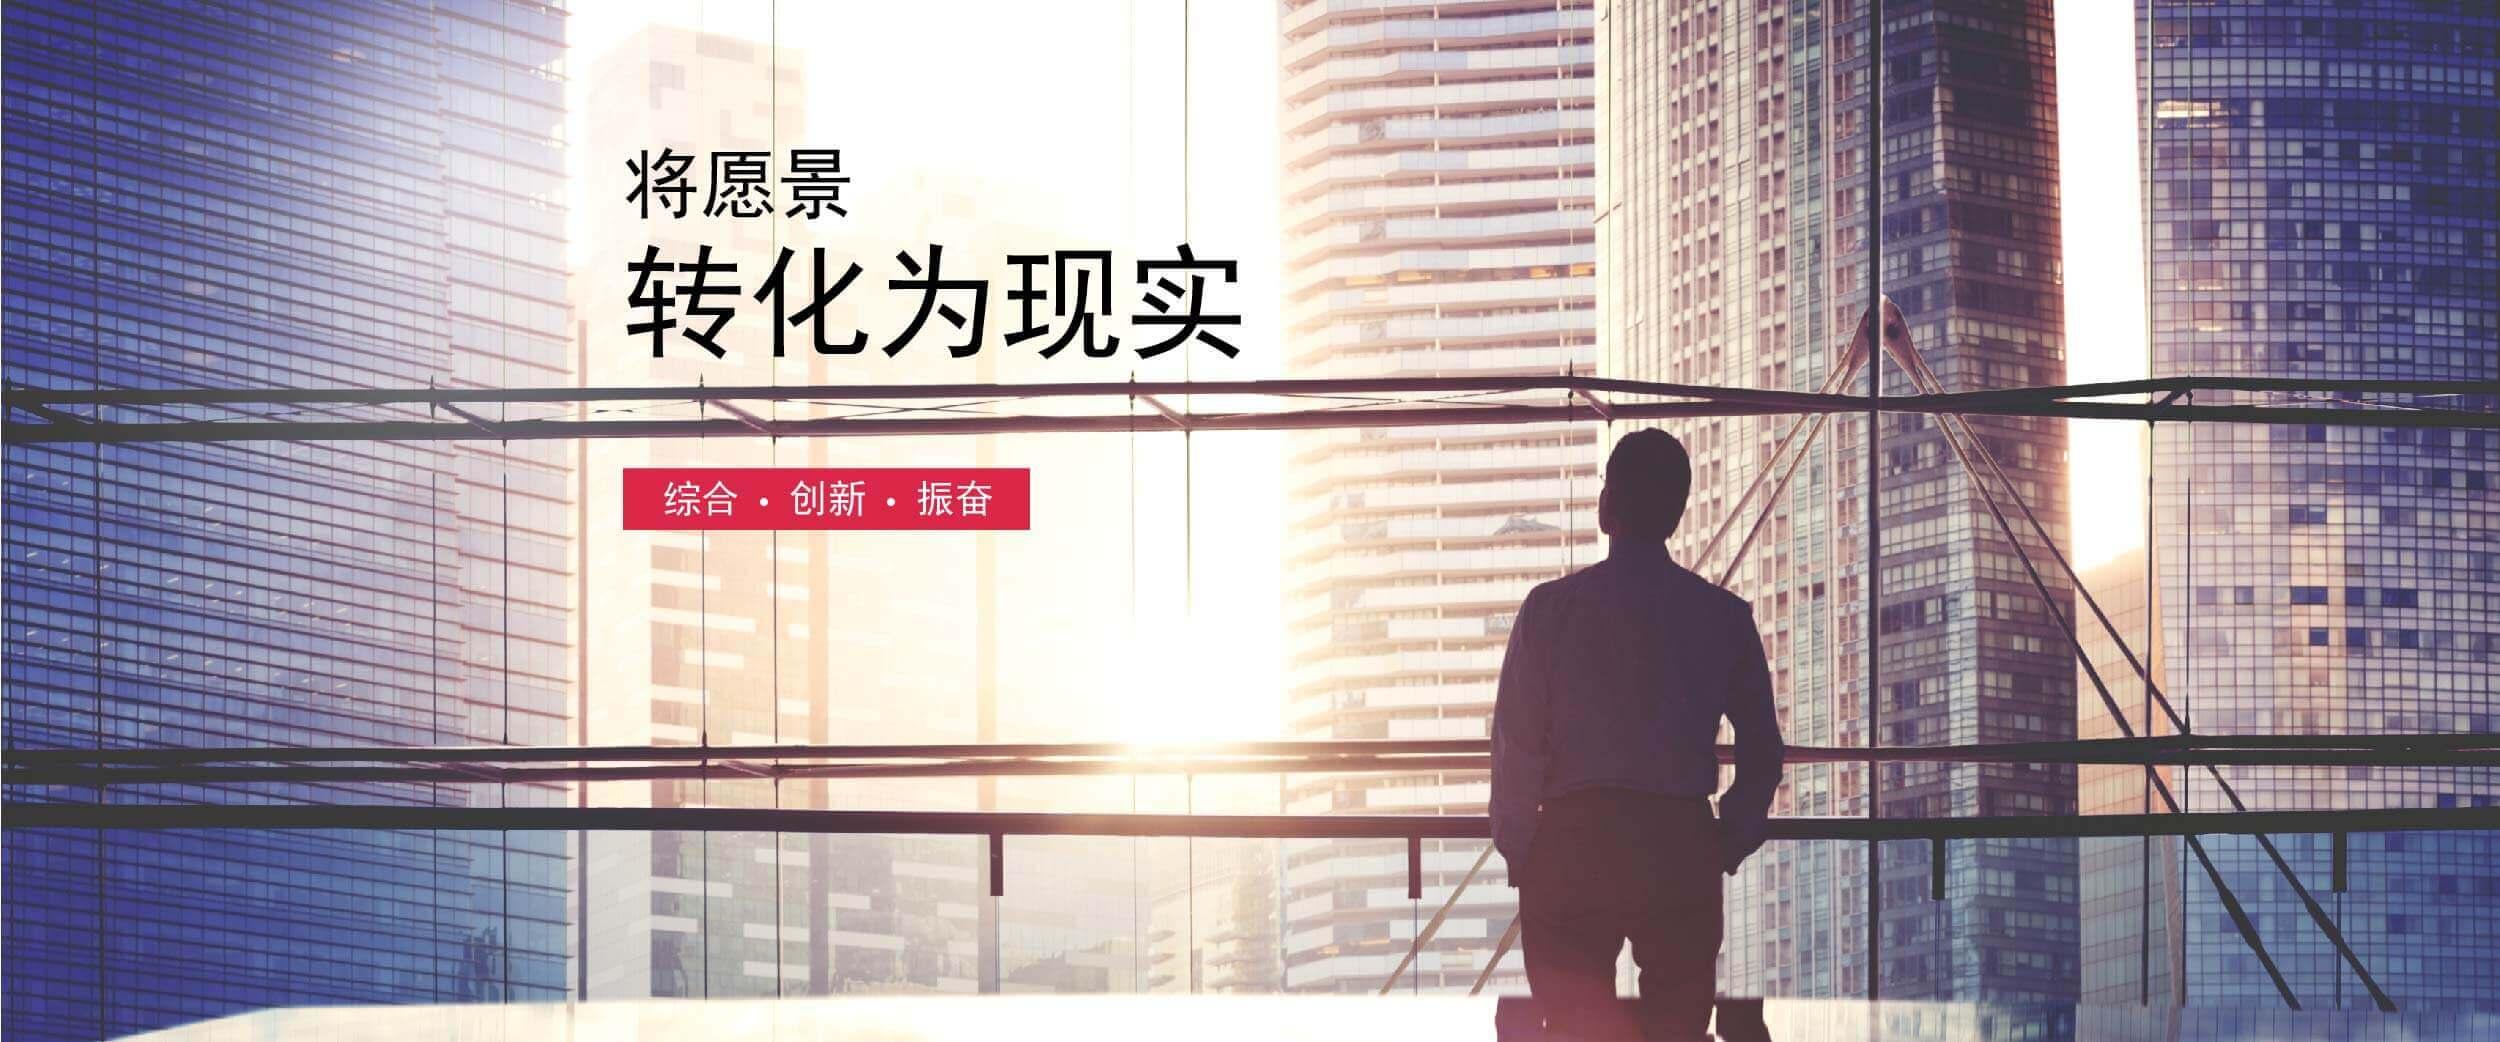 http://www.surbanajurong.com.cn/projects/?lang=zh-hans